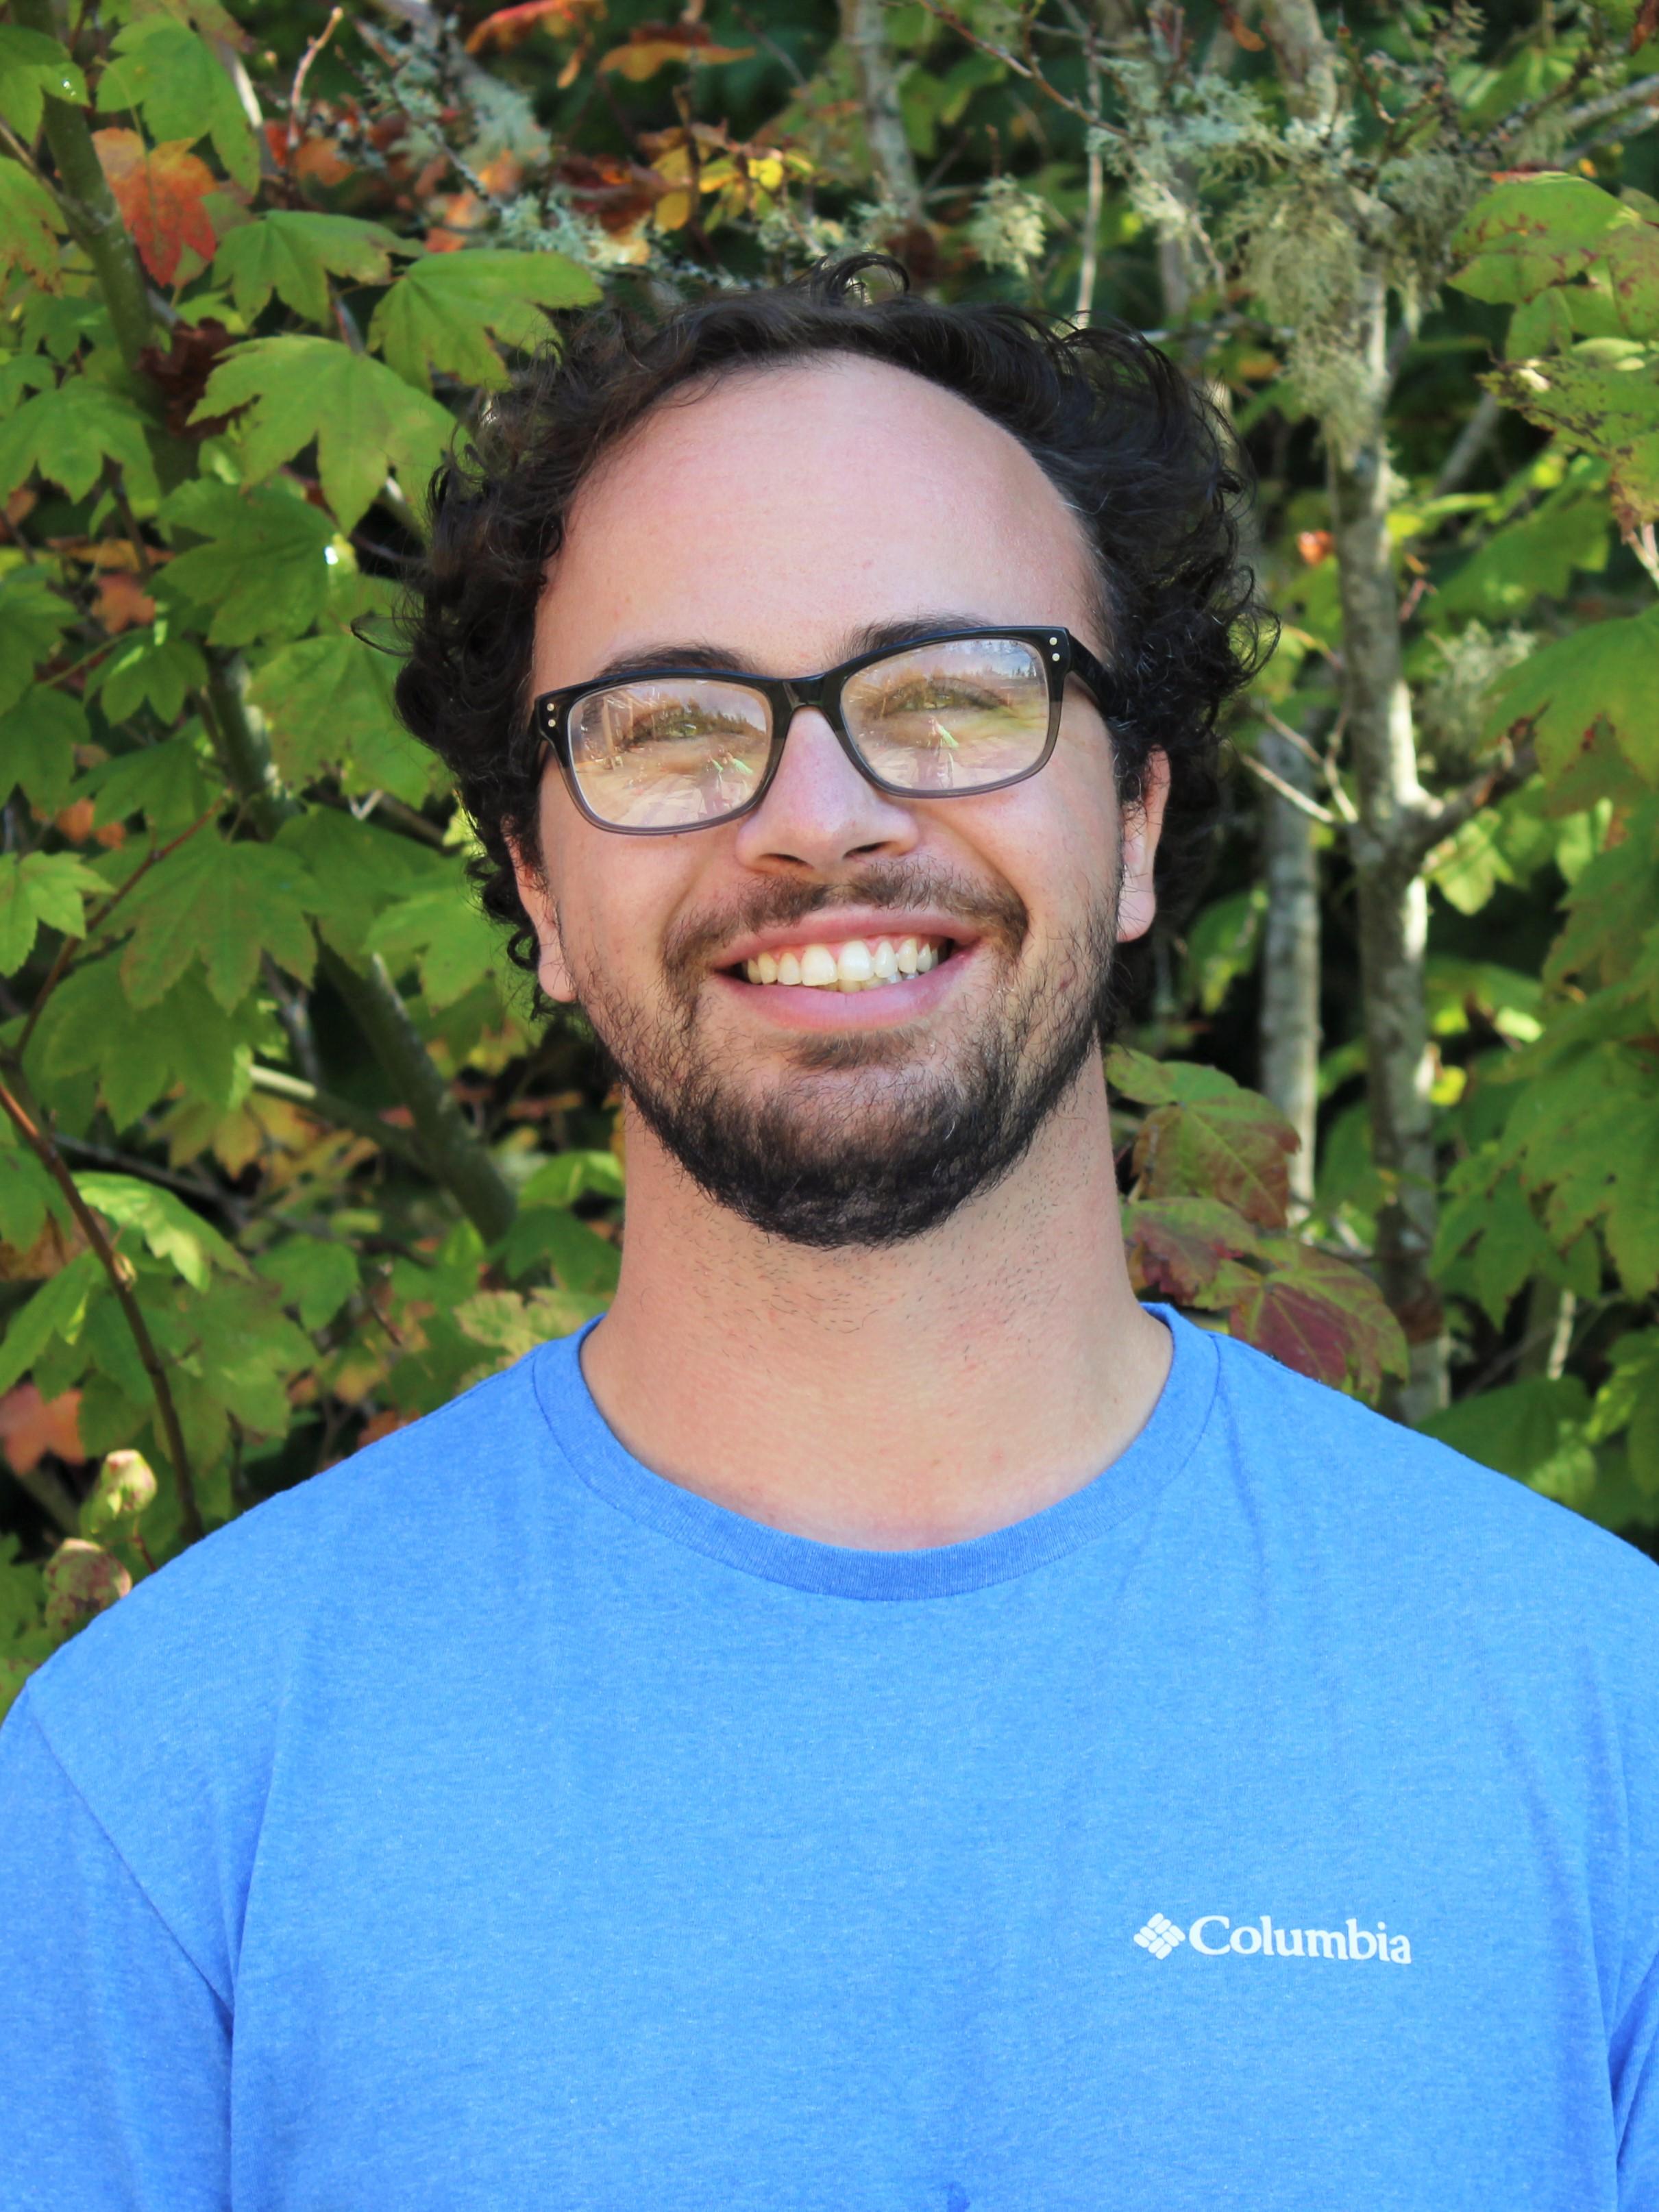 IslandWood Graduate Program student Jacob Kreuzer